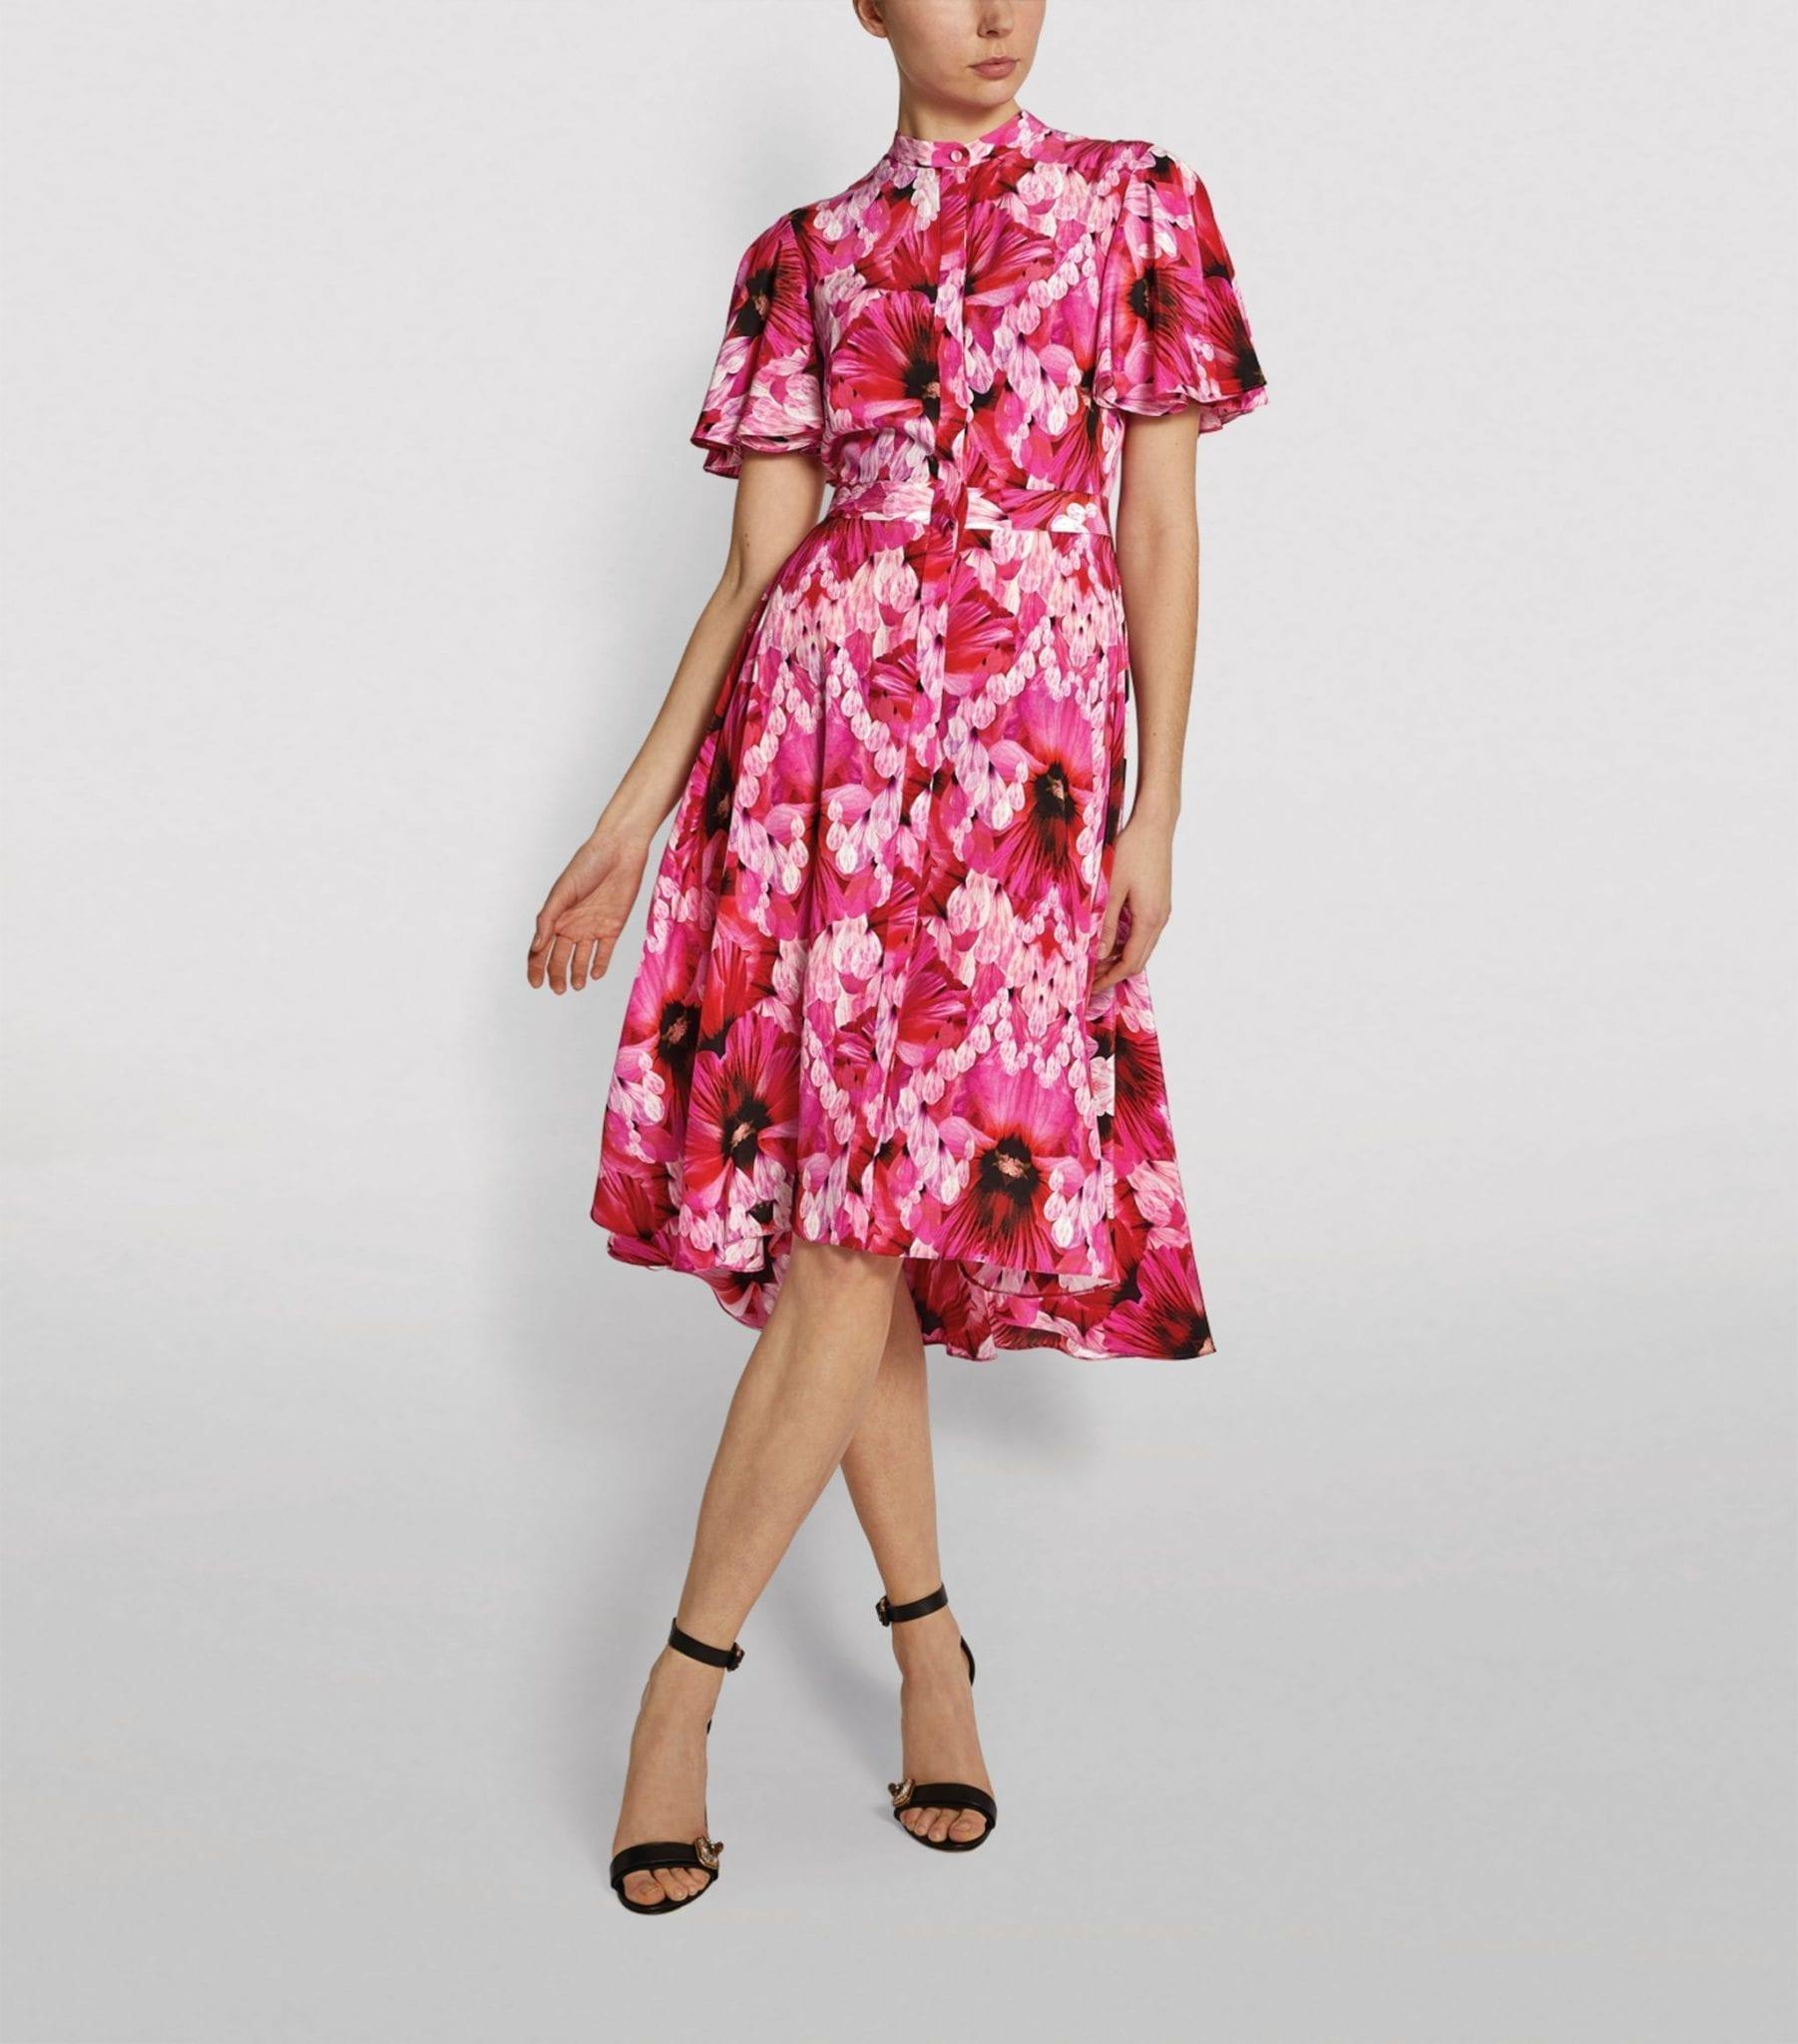 ALEXANDER MCQUEEN Endangered Flower Print Midi Dress